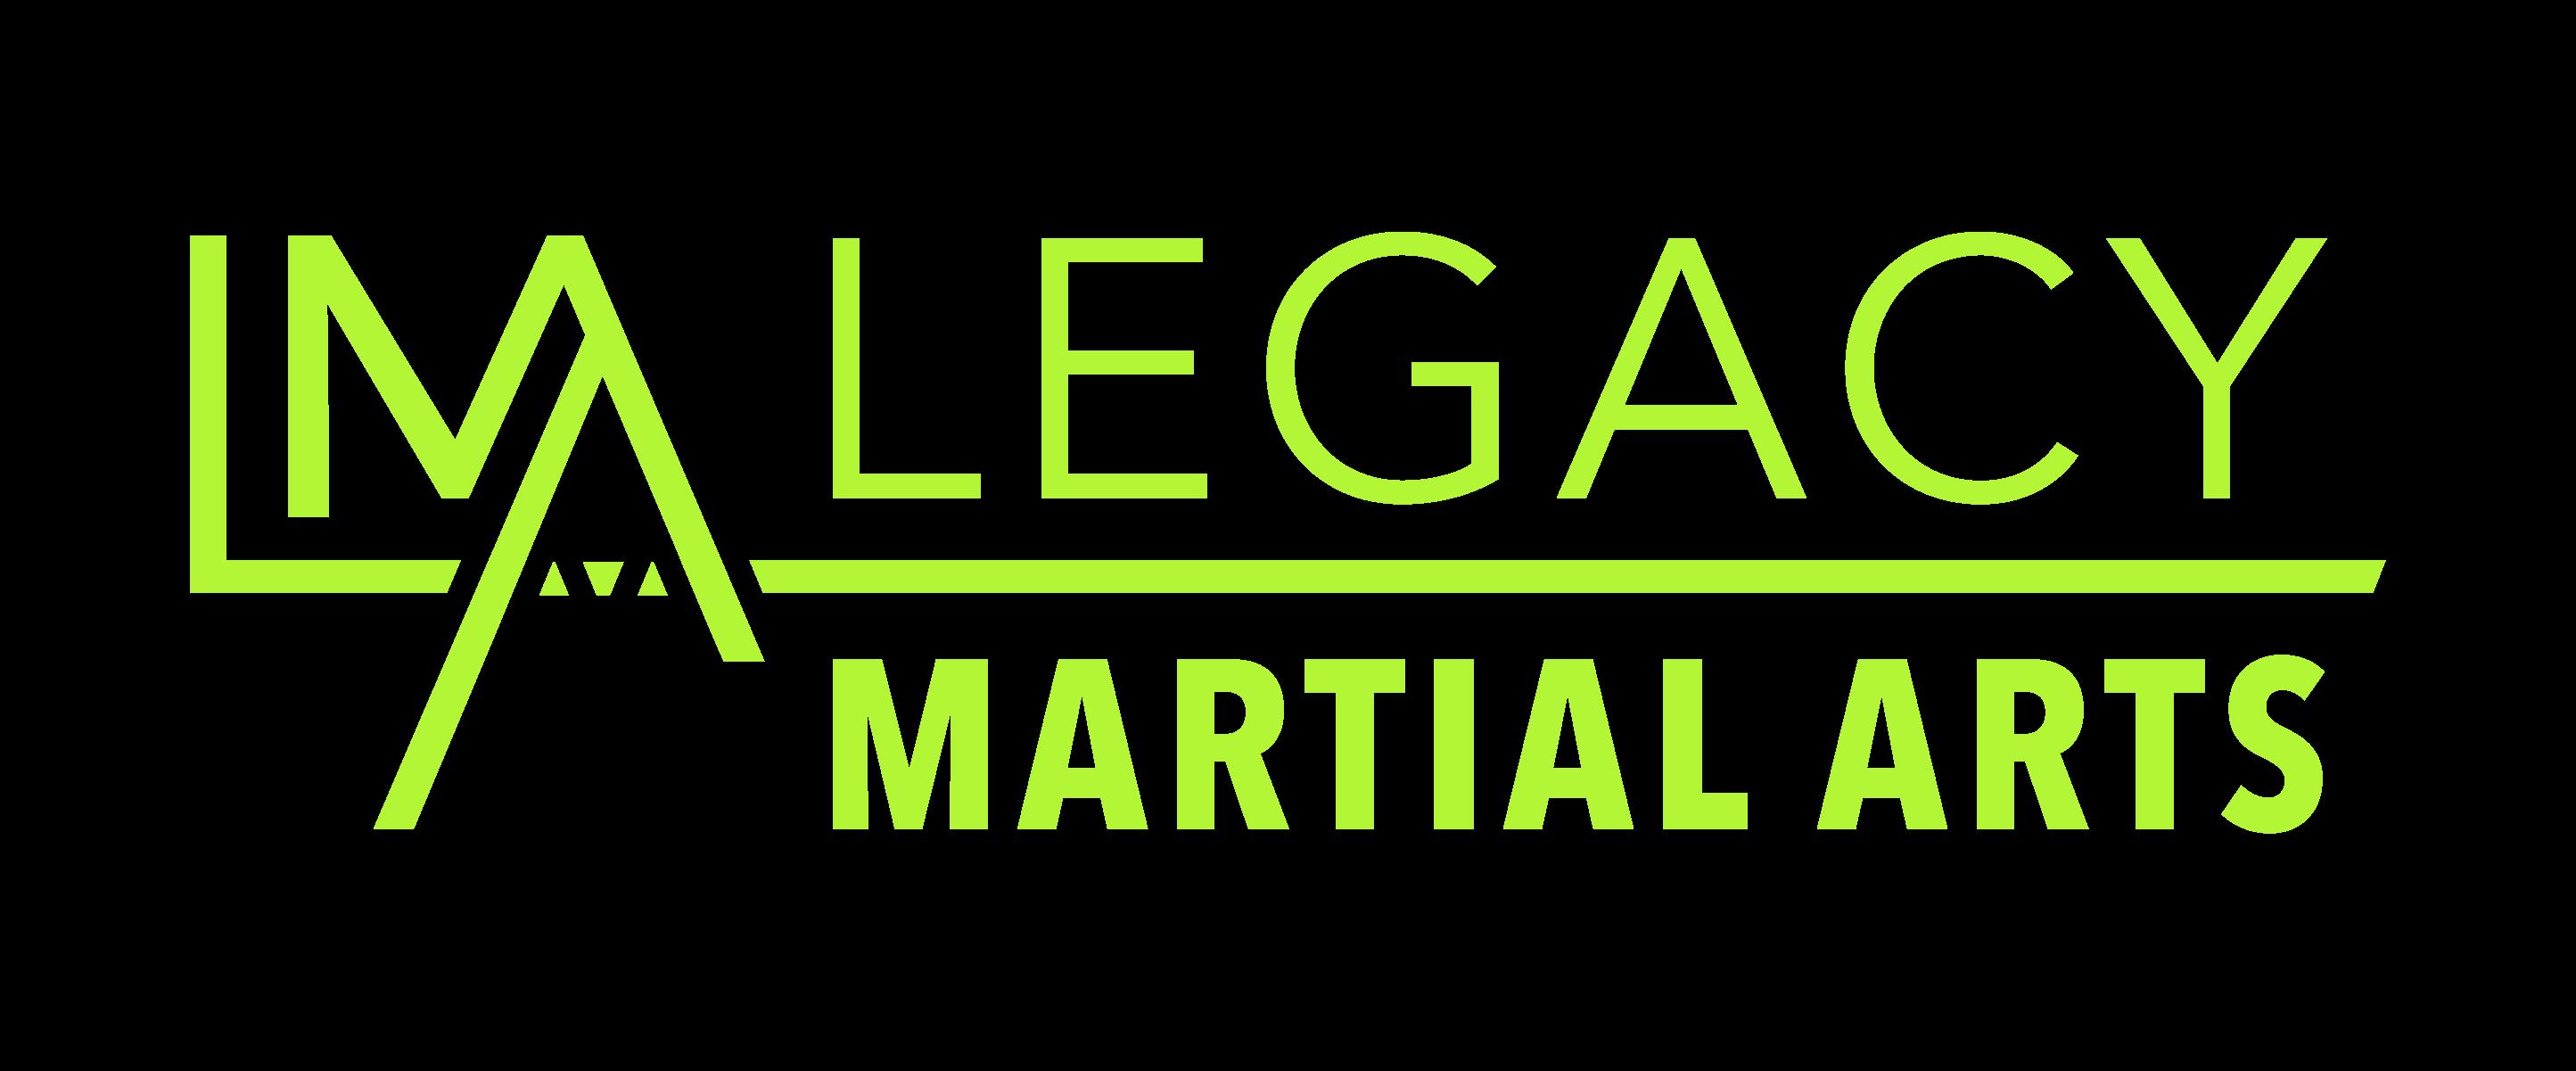 Legacy Martial Arts